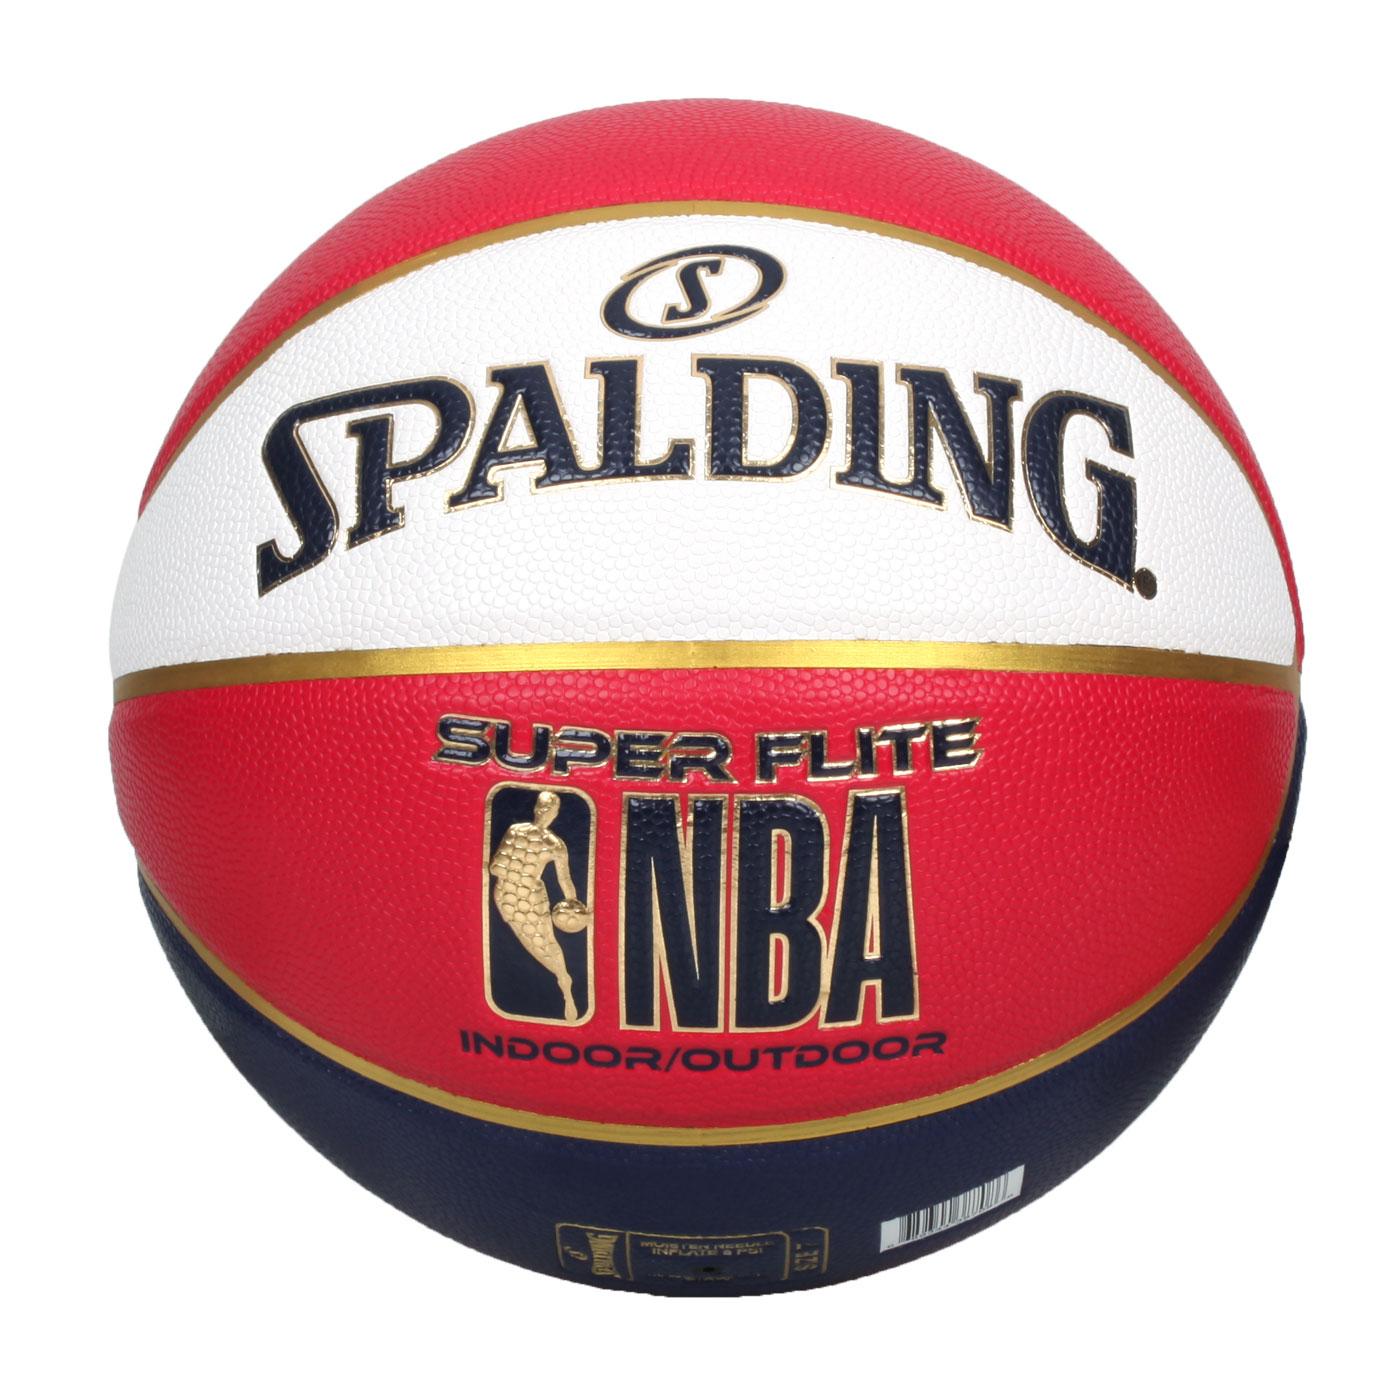 SPALDING NBA SUPER FLITE系列#7號合成皮籃球 SPA38708 SPA76352 - 丈青紅白